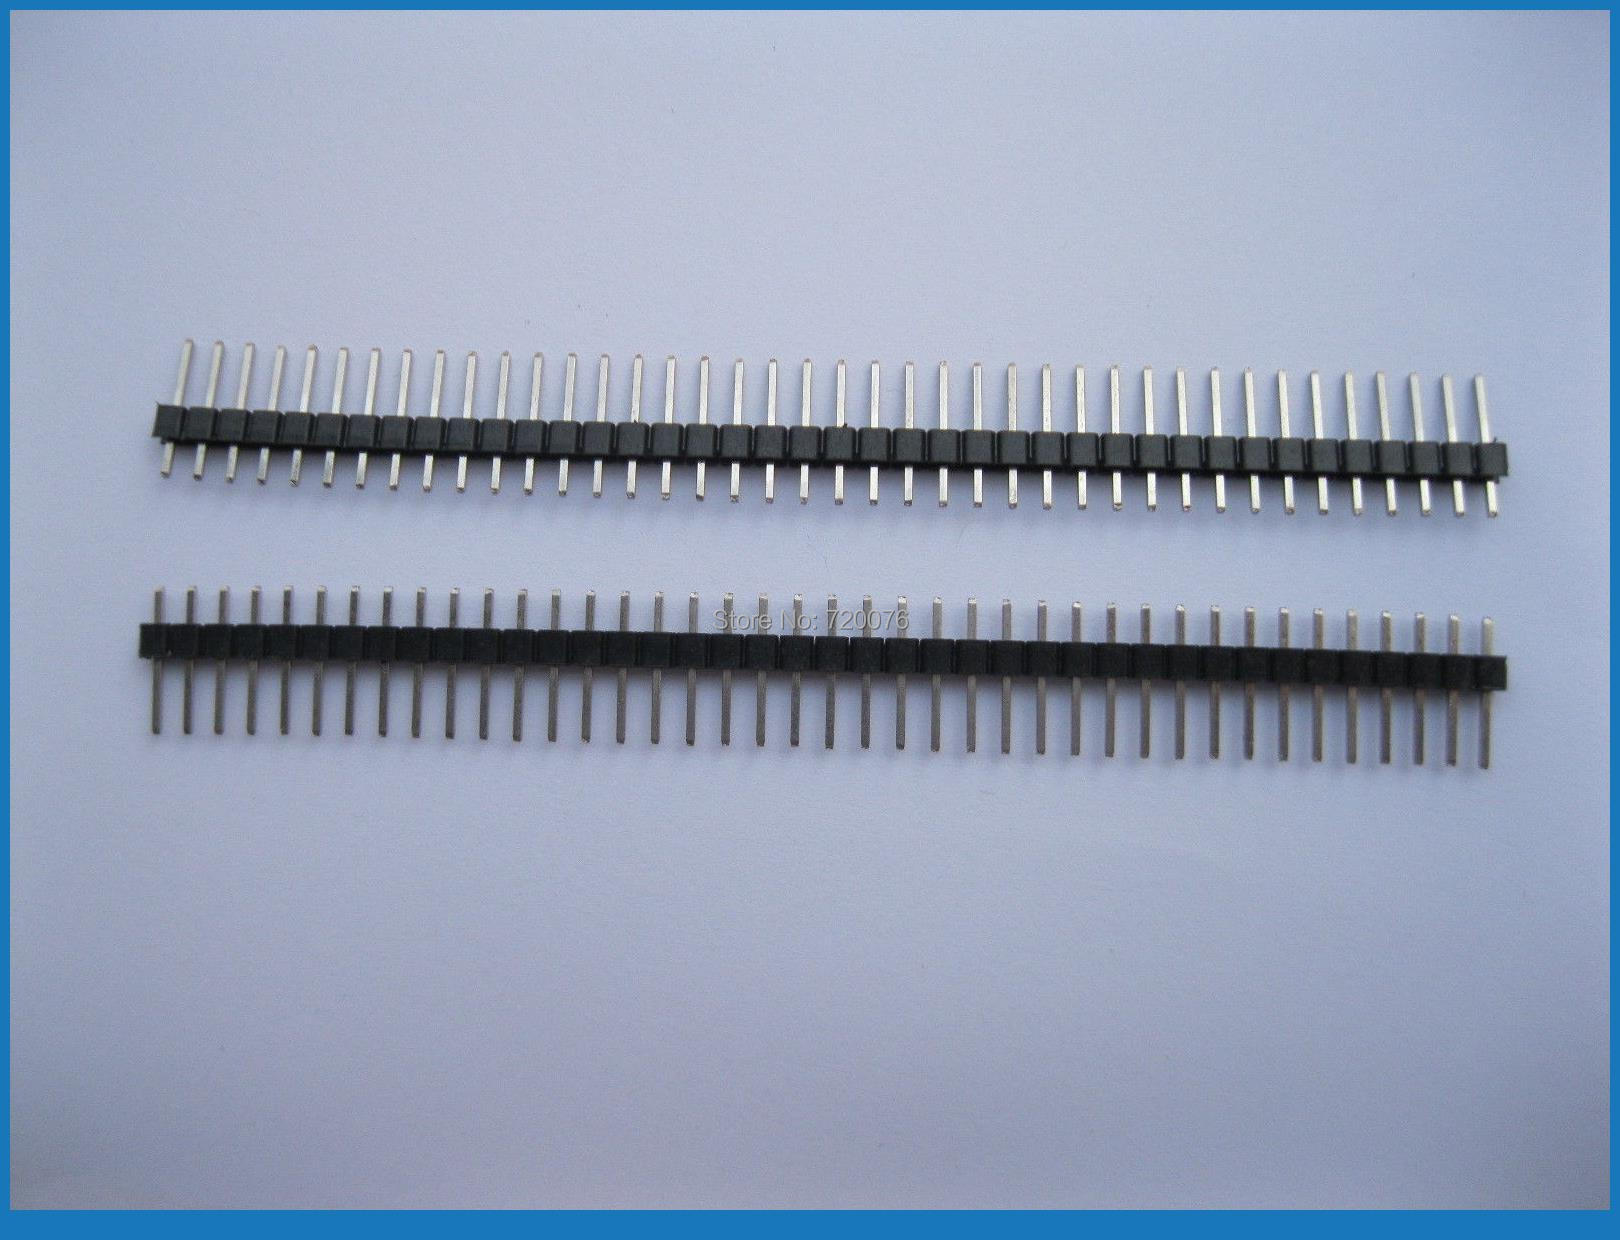 200 pcs 2.54mm Breakable Pin Header 1x40 40pin Male Single Row Strip<br>